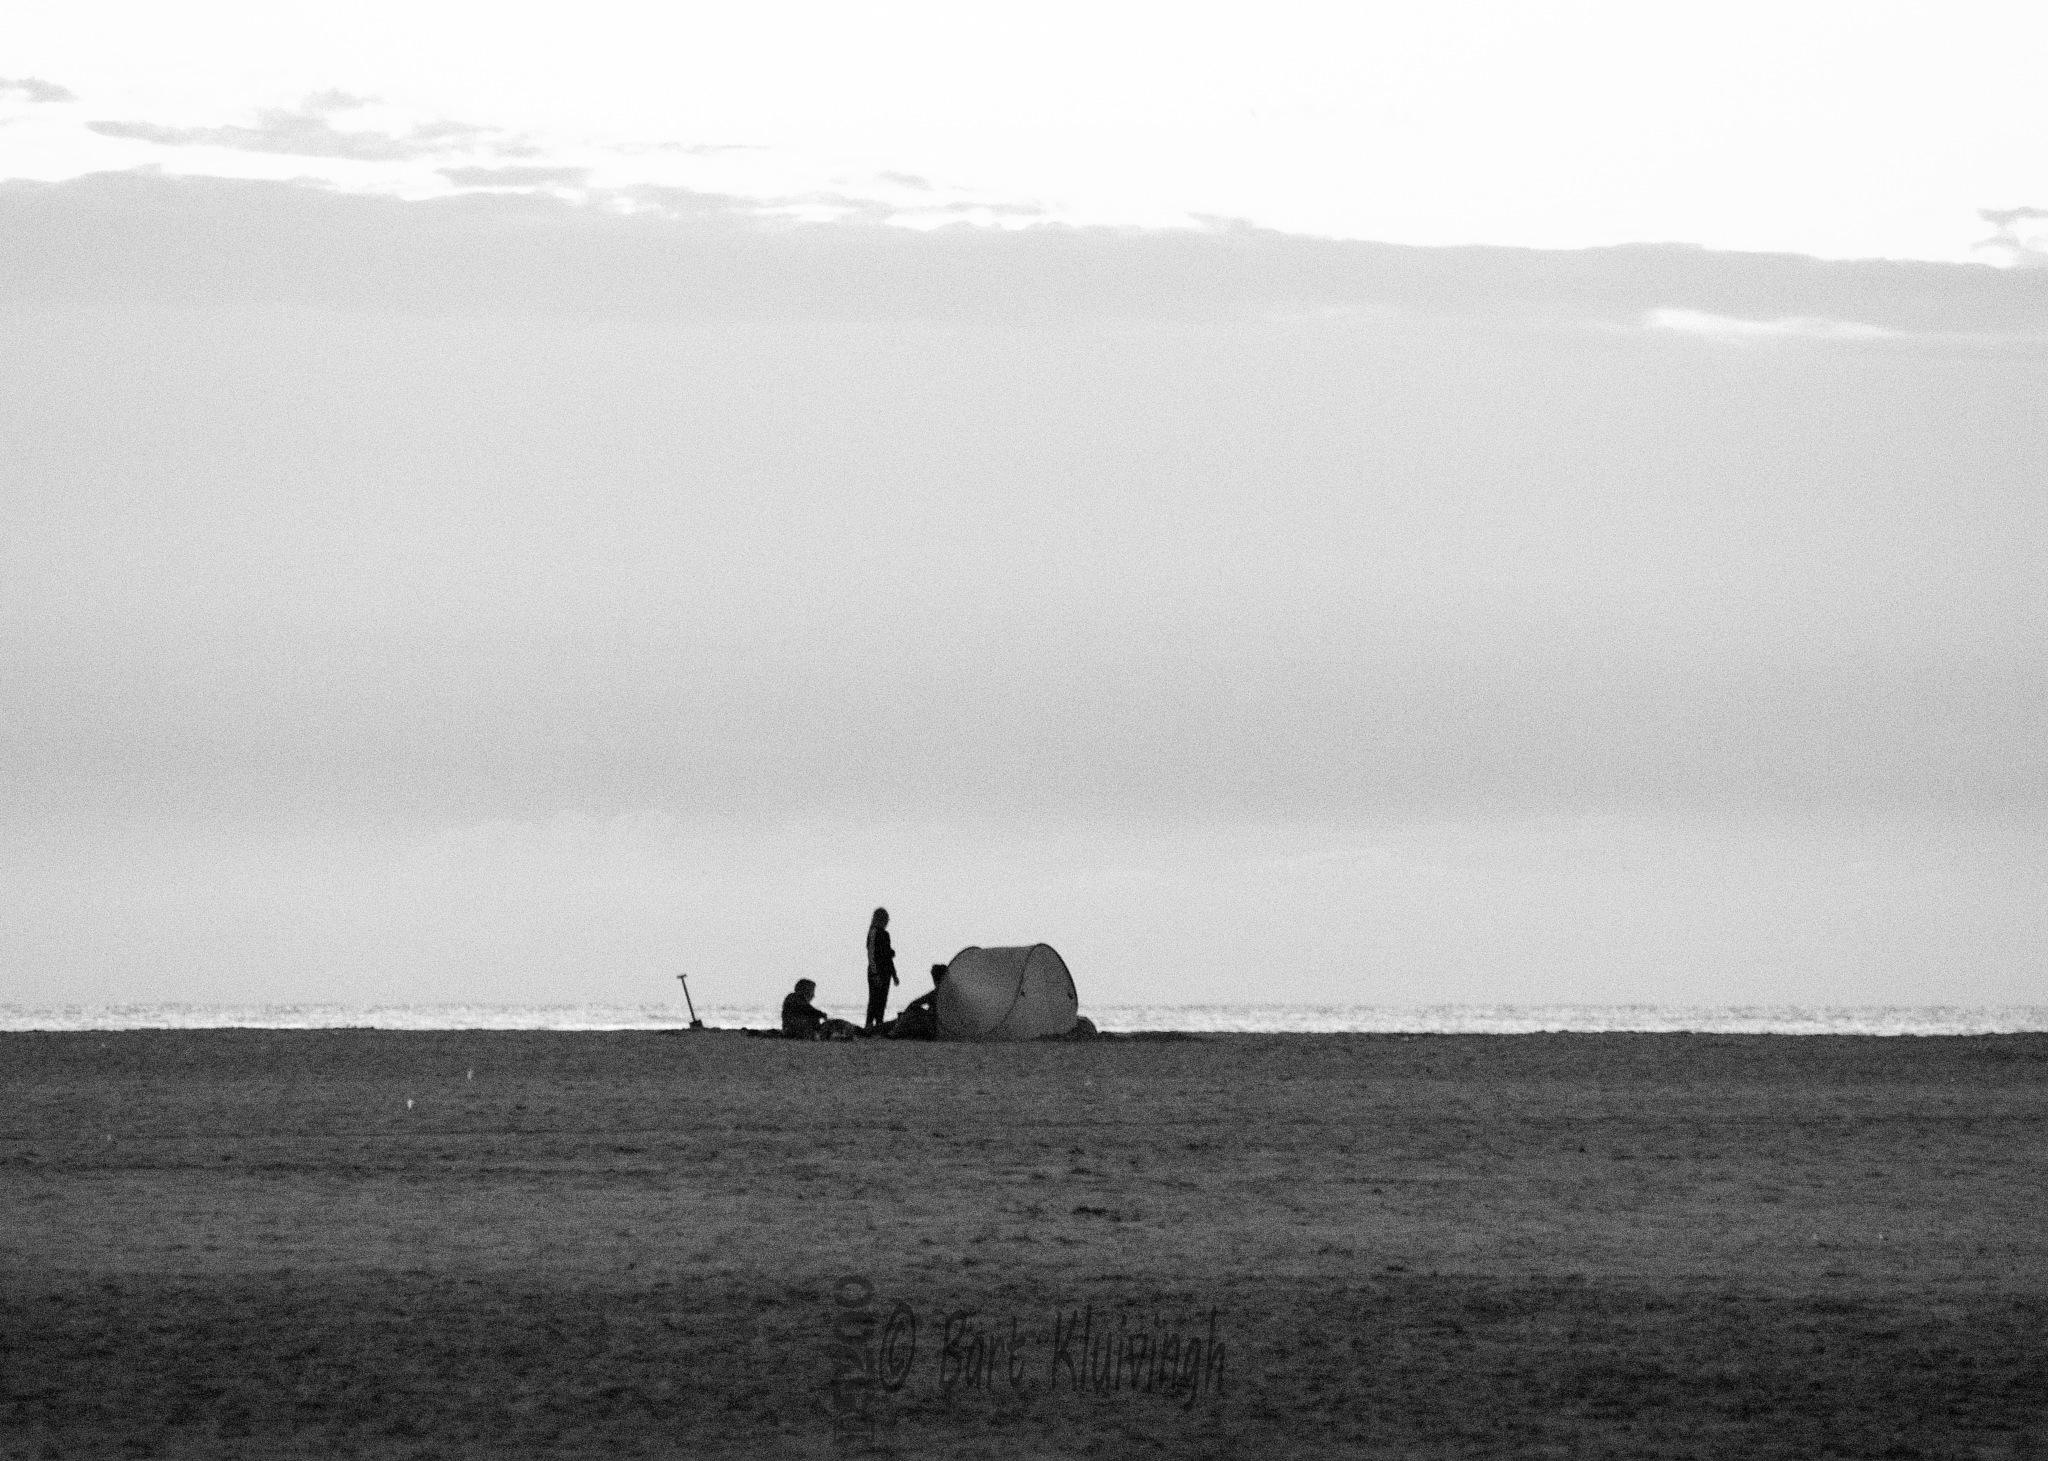 Beach by Bart Kluivingh Fotografie